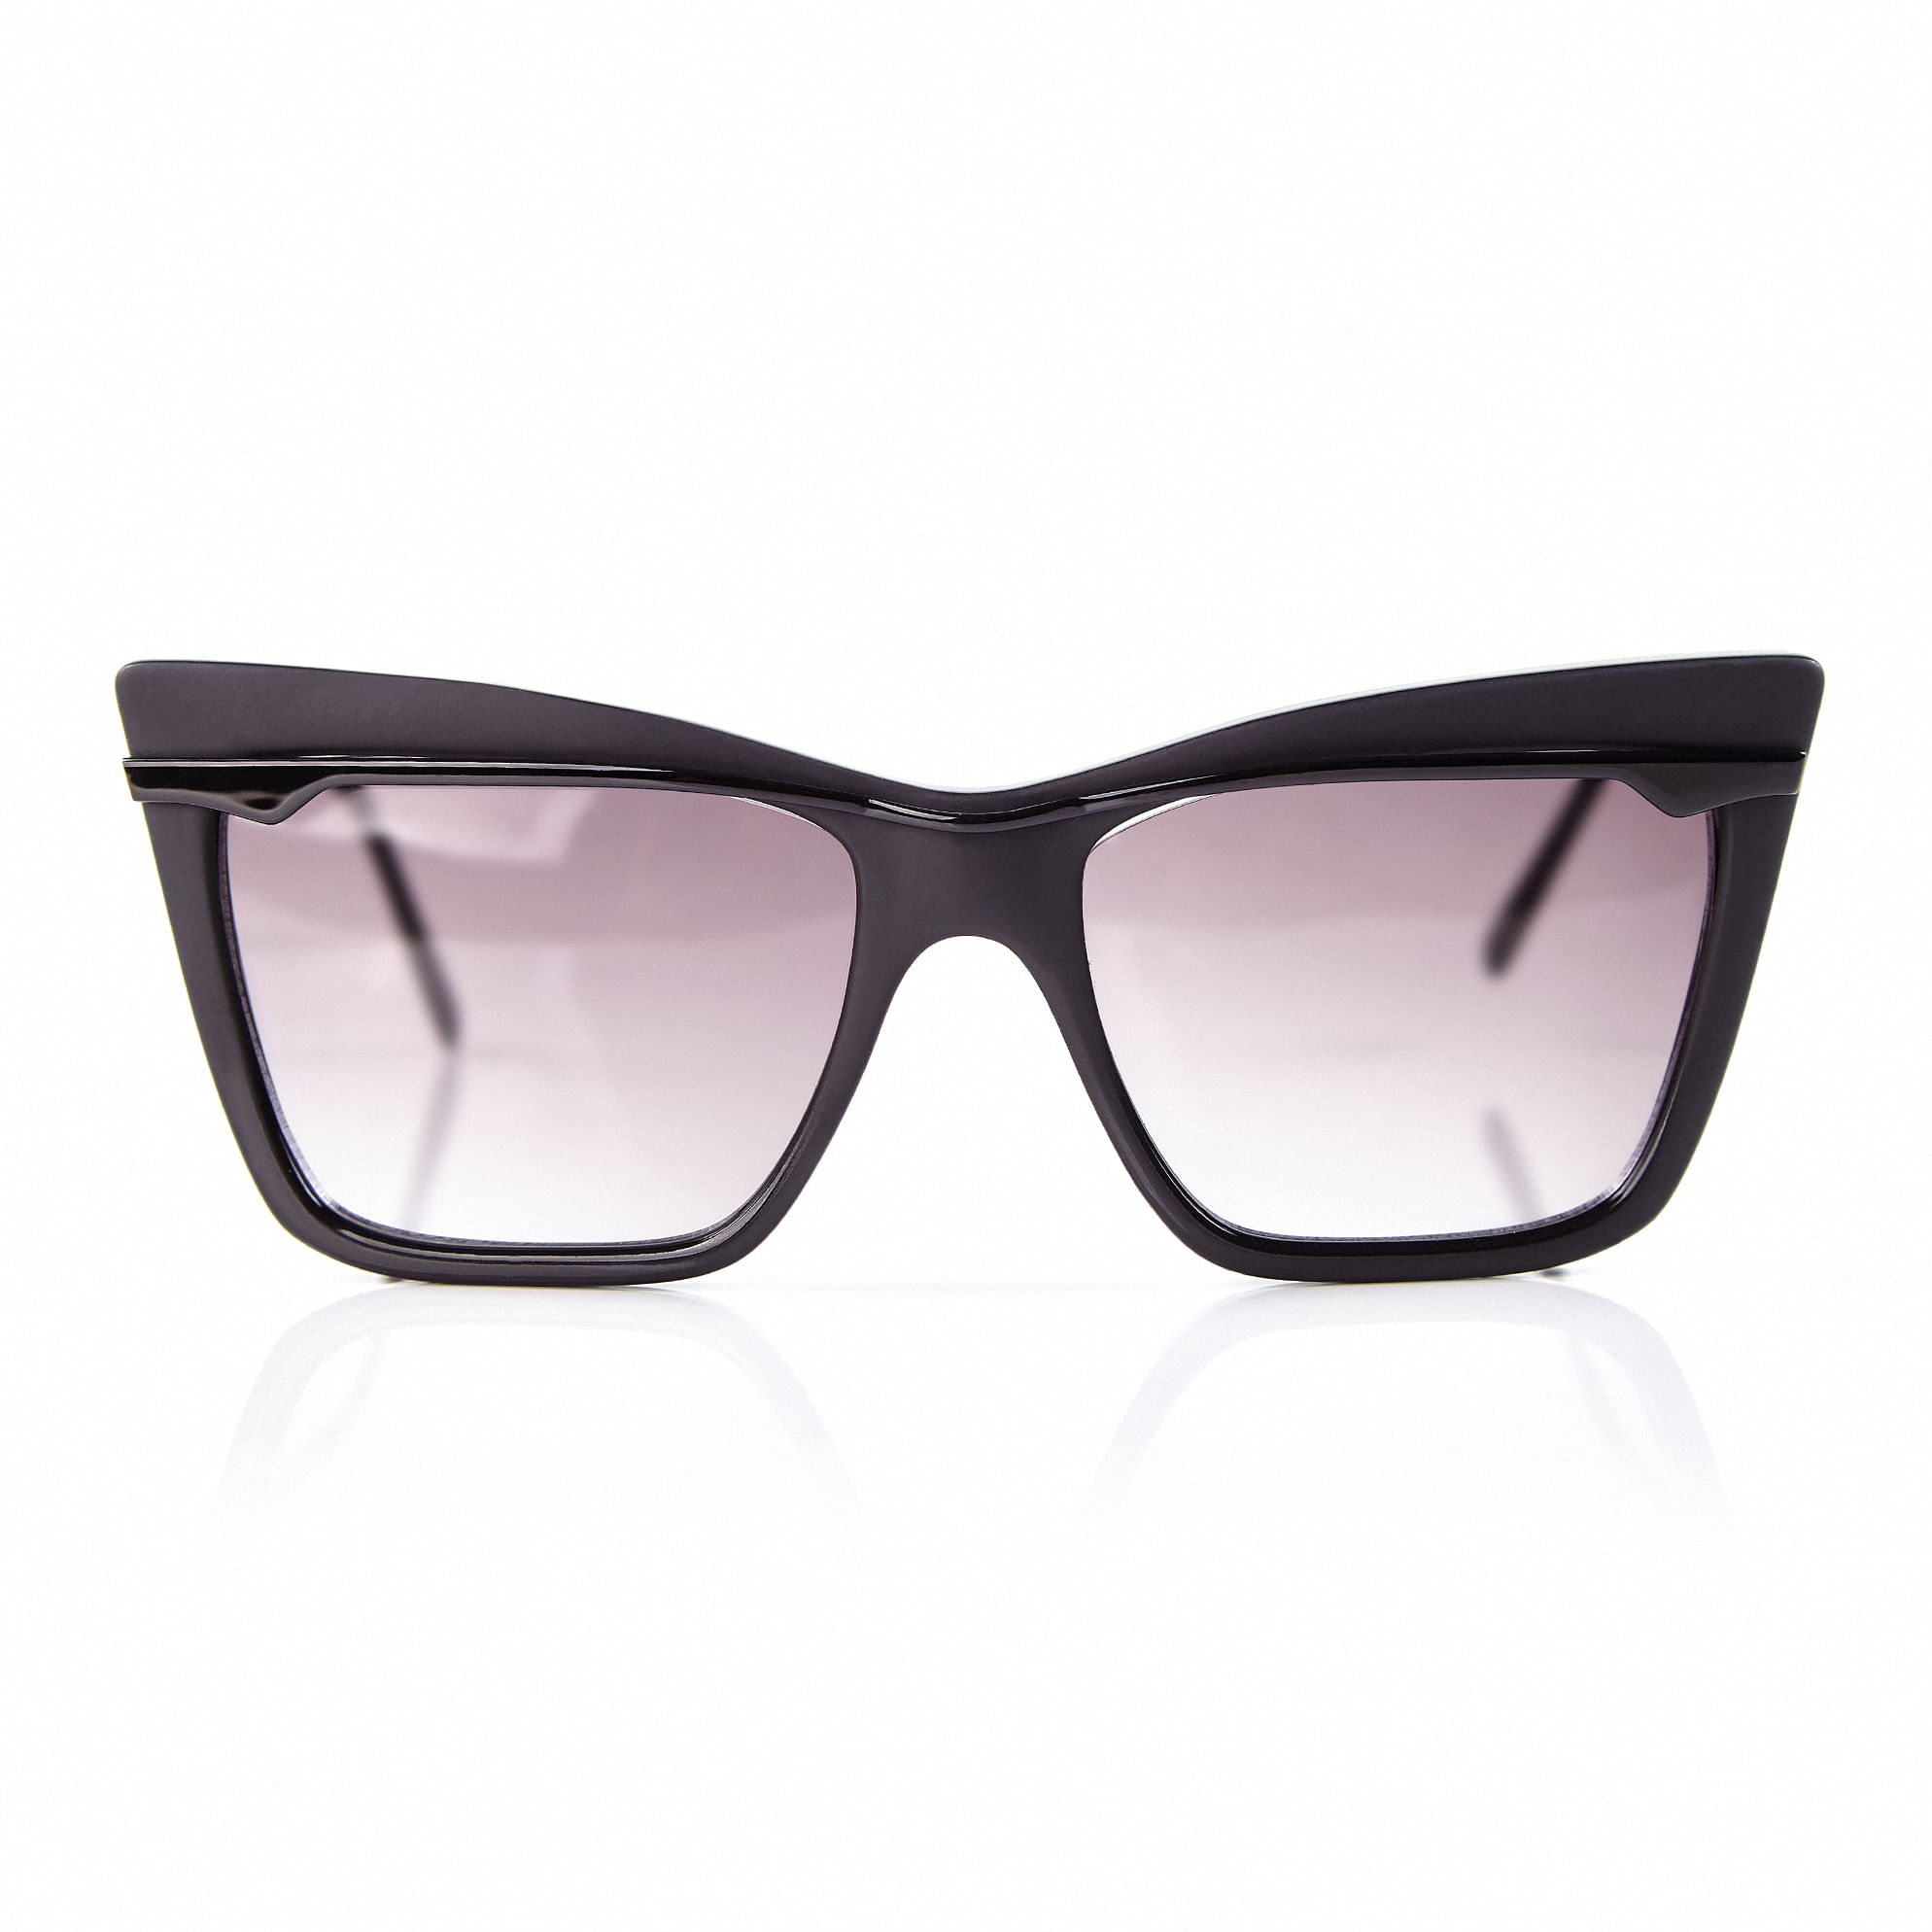 c2b5b68ec6aaf morenarosa · Acessórios · Óculos · Oculos Max Gatinho Preto - TU